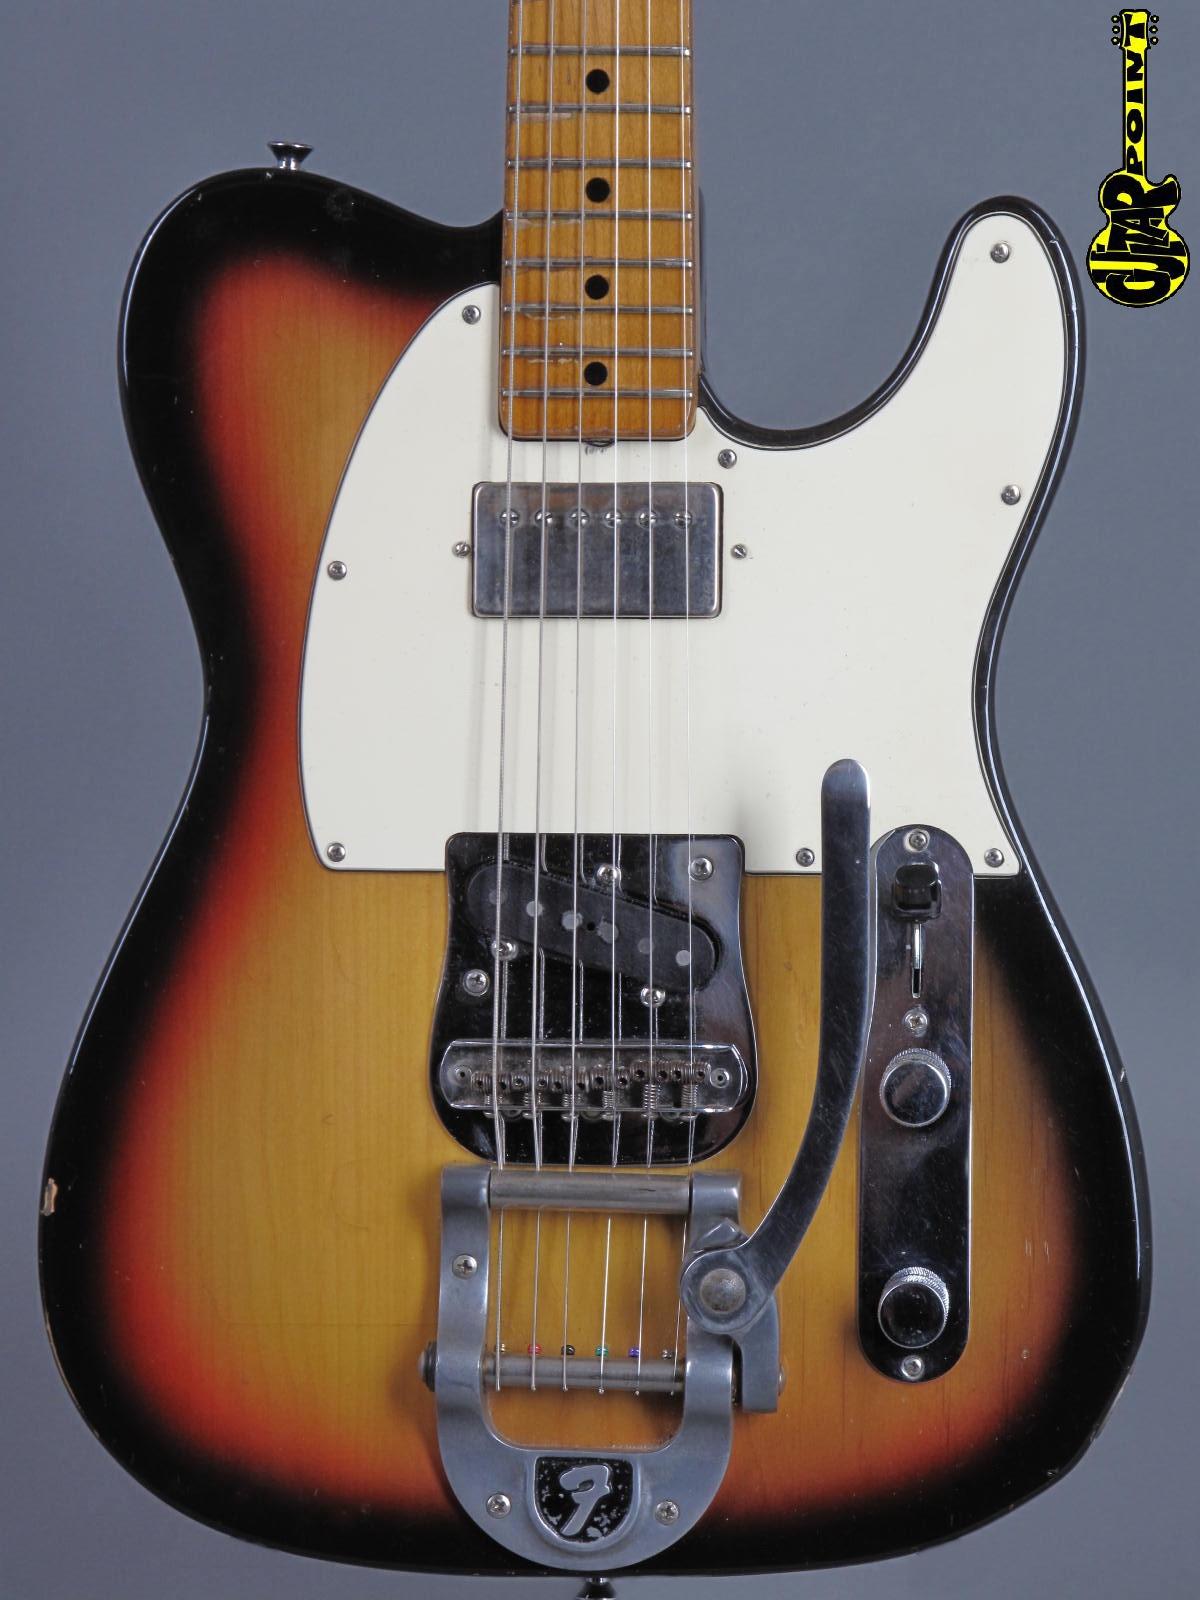 1972 Fender Telecaster - 3-tone Sunburst / Bigsby